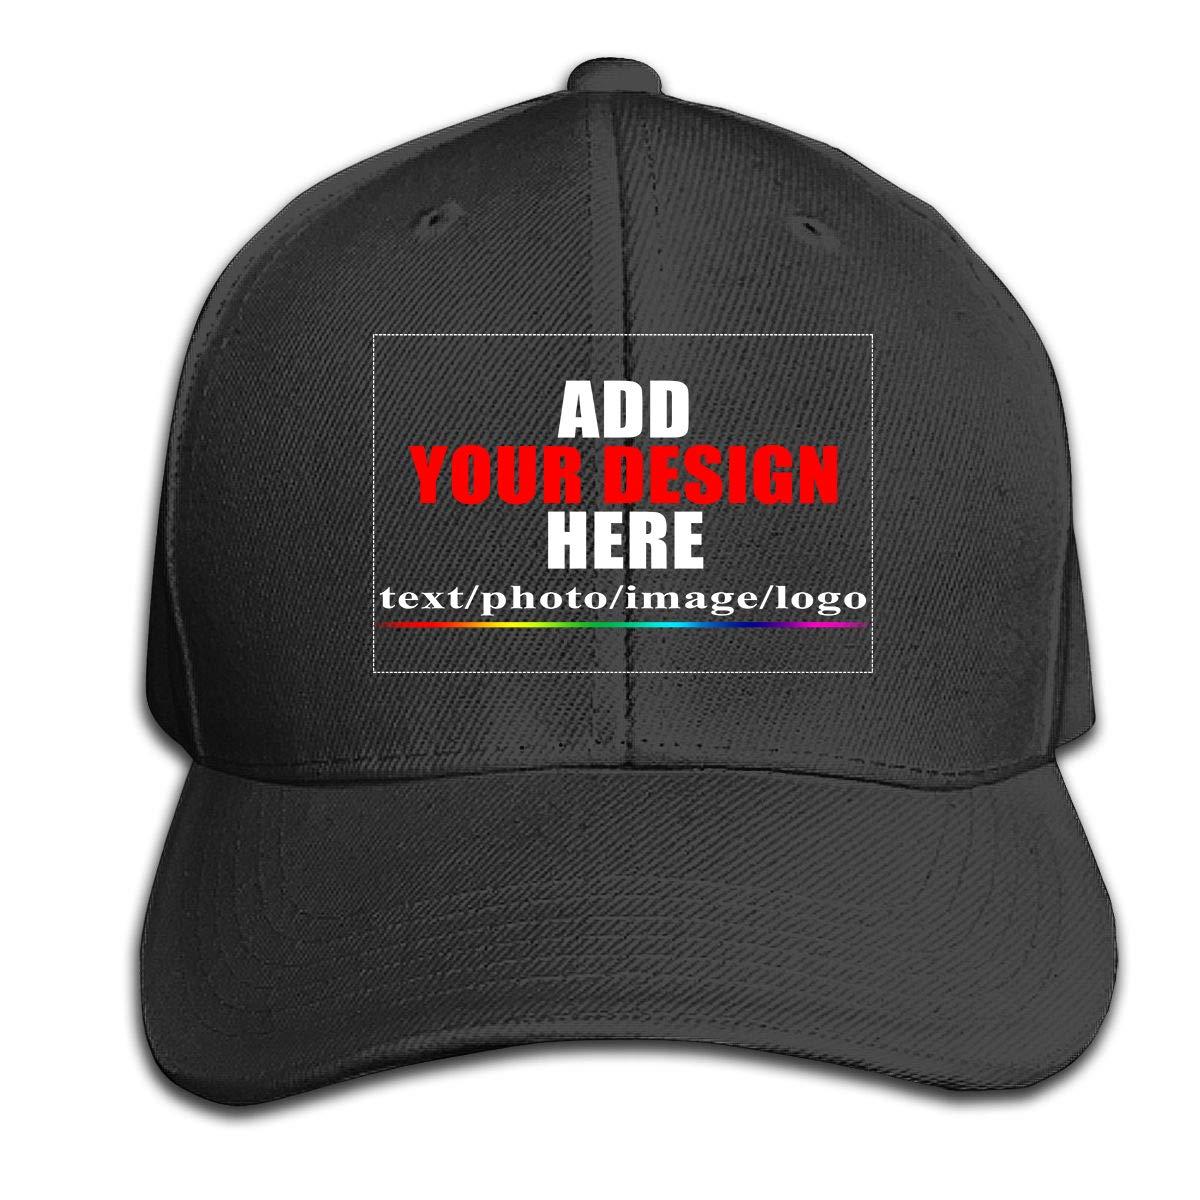 Custom Baseball Caps, Design Your Own Hat, Team Photo Text Logo Graphic Print